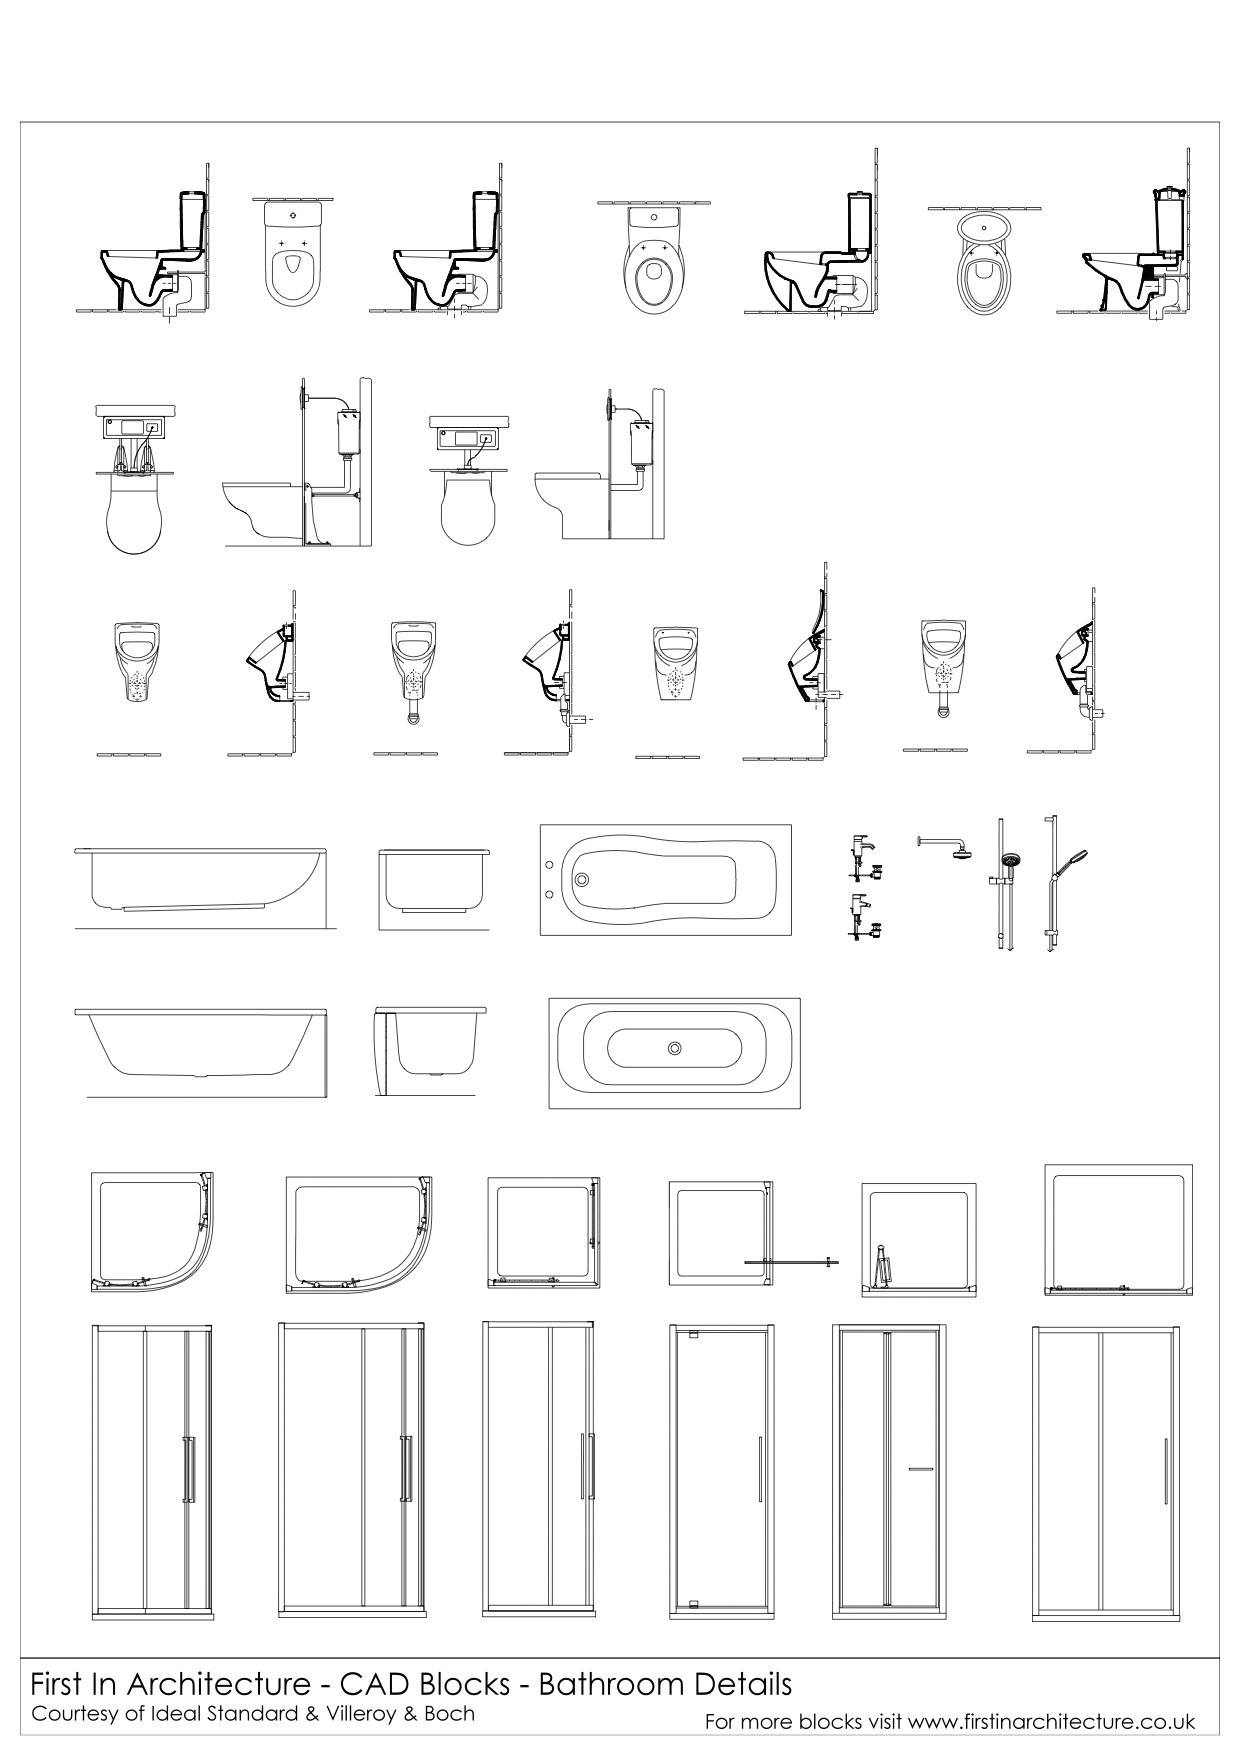 cad blocks bathroom detail mega pack